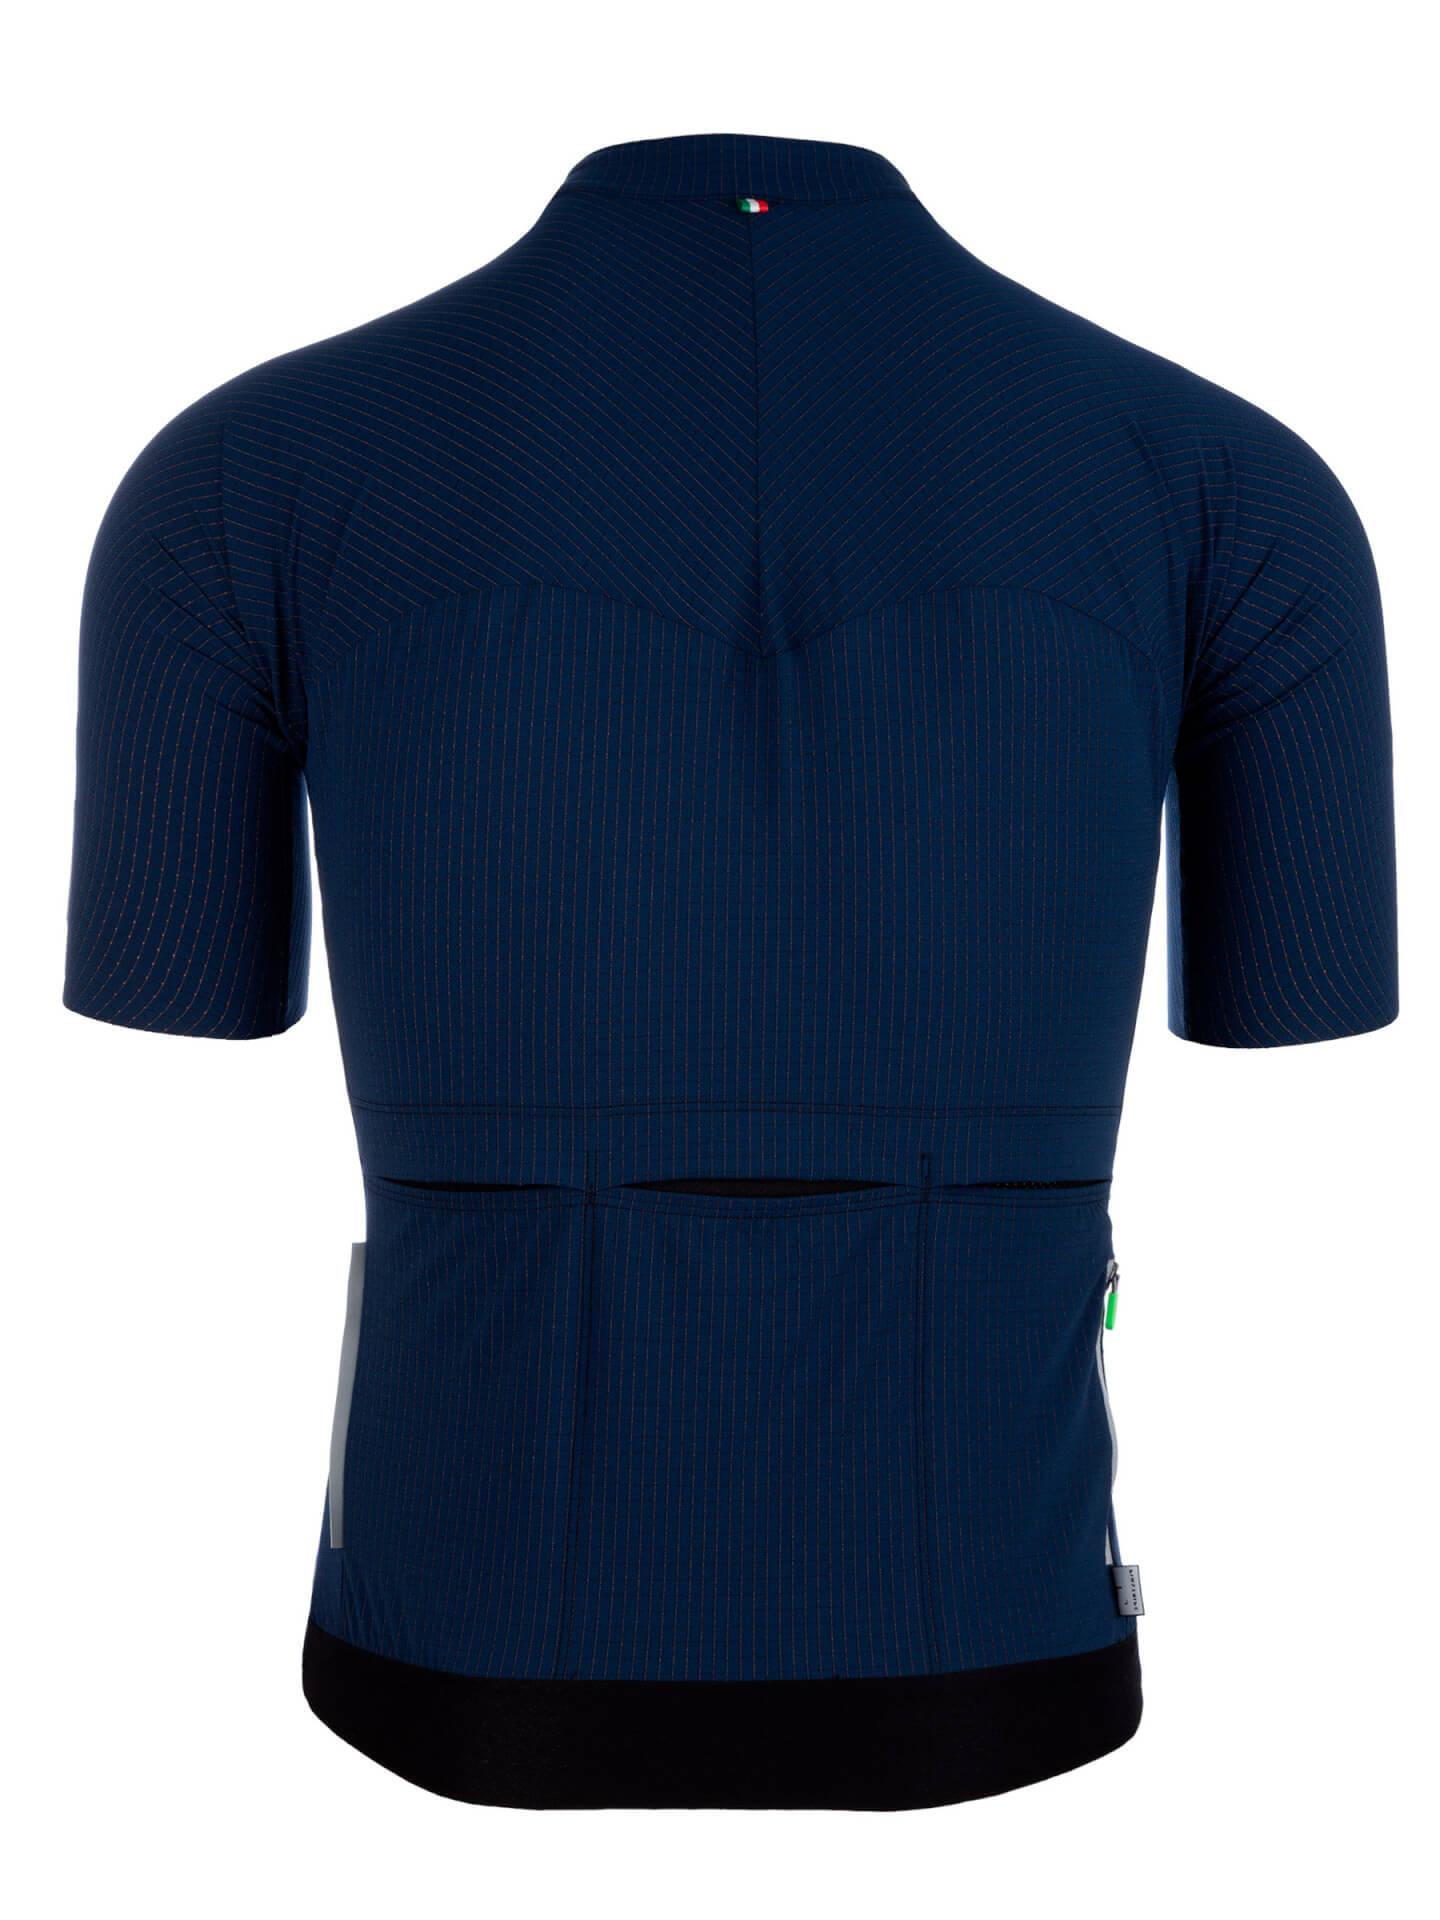 Maillot manches courtes L1 Pinstripe X bleu marine